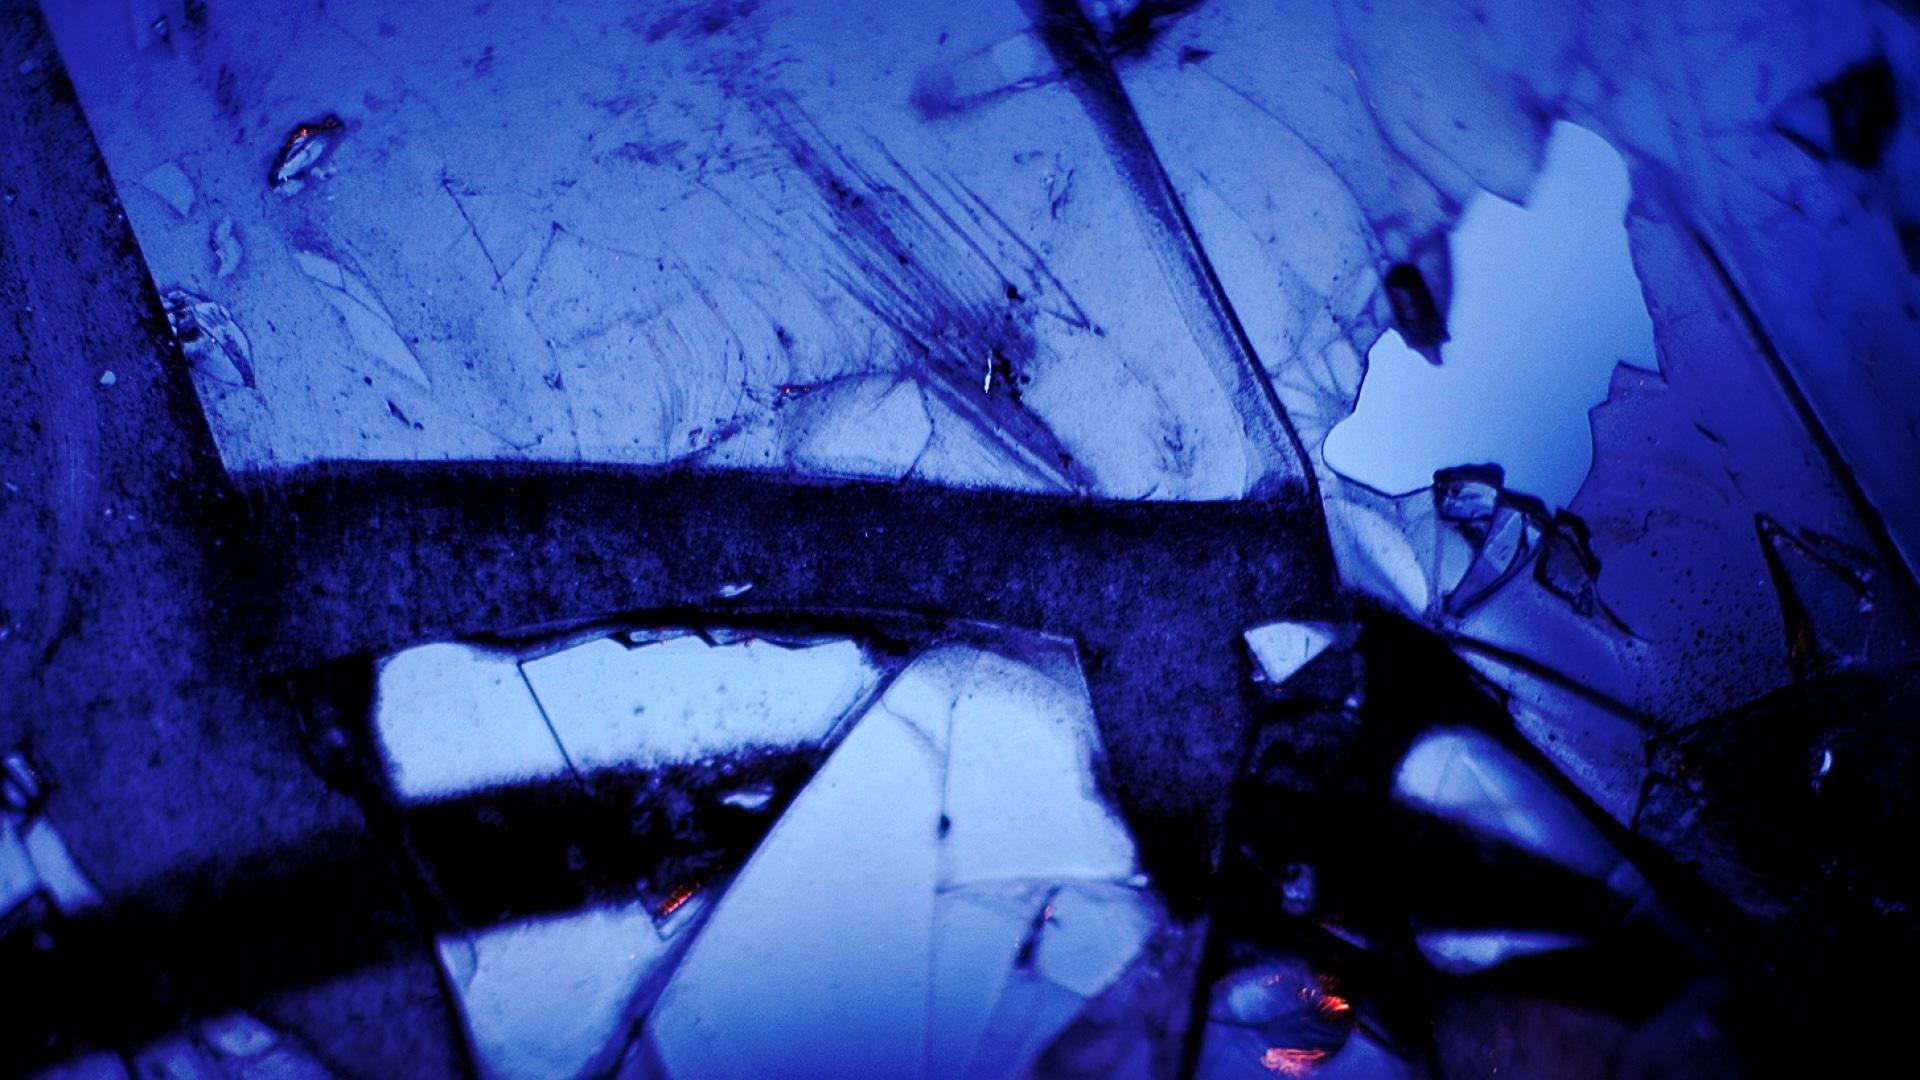 PhotographyArsenie Coseac